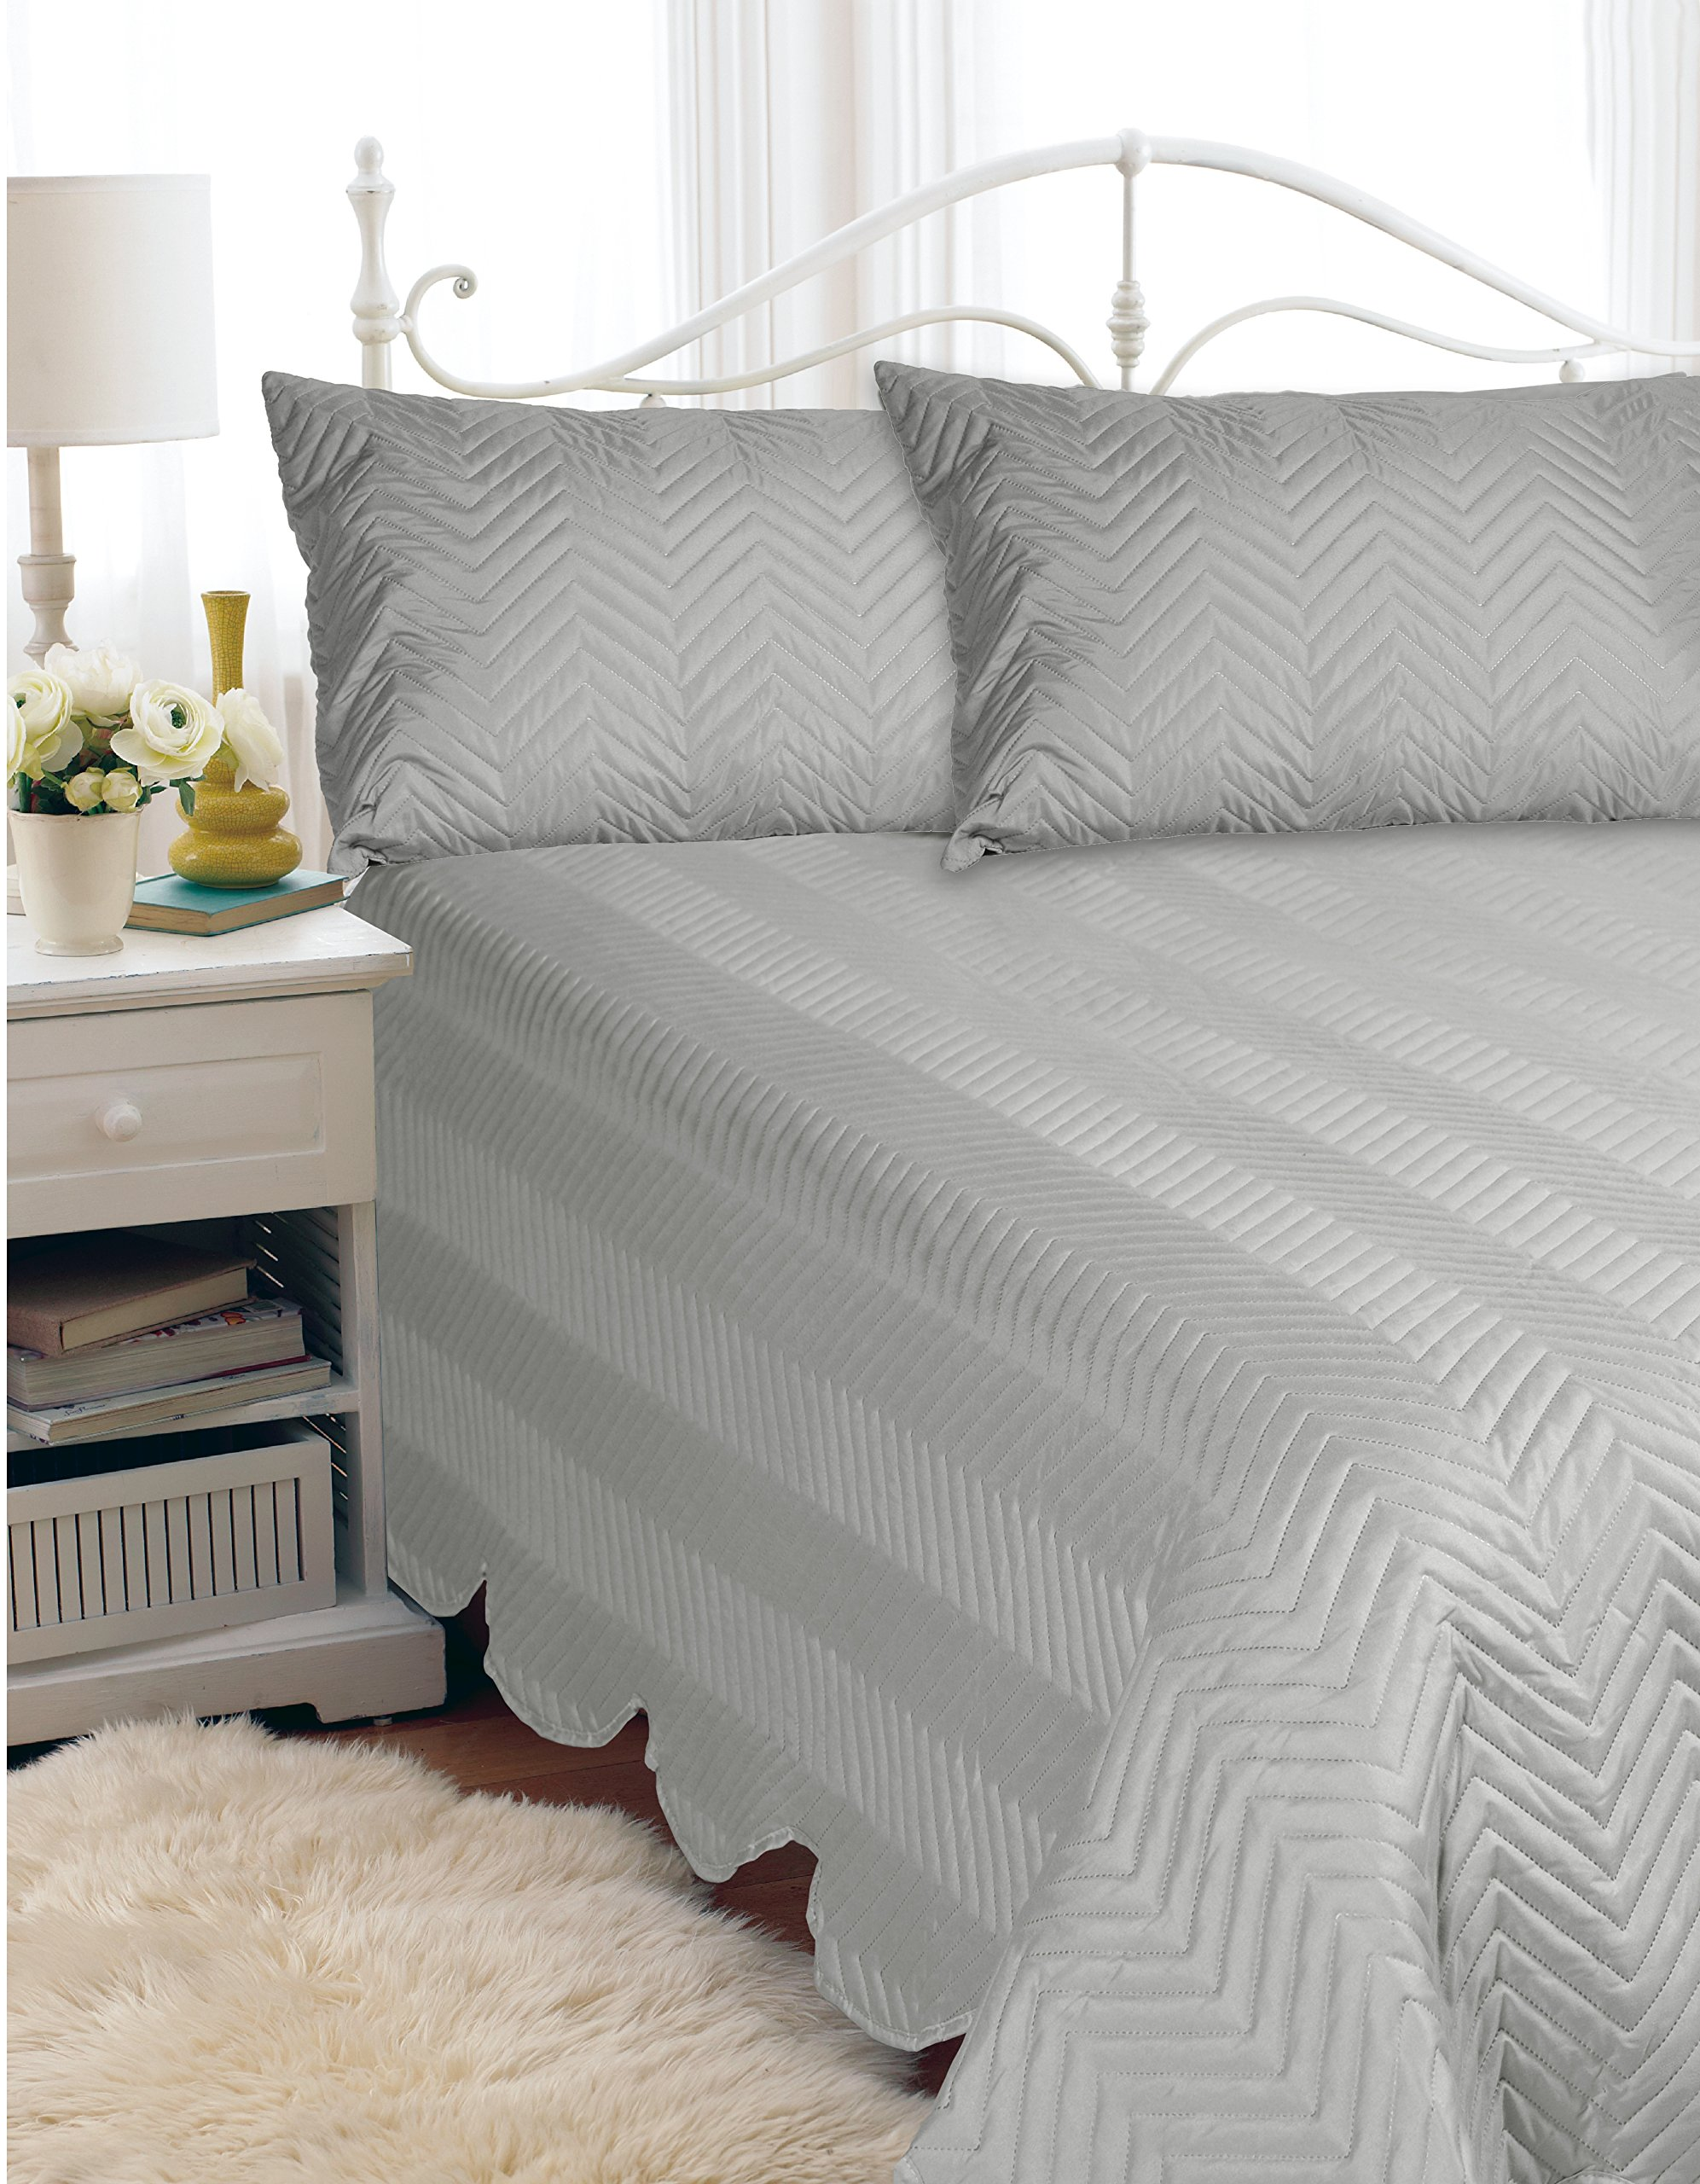 HOTEL 07160 ''Hotel''Quilt Bedspread Set Grey-D/Q Quilted Bedspread Set Grey- Full/Queen